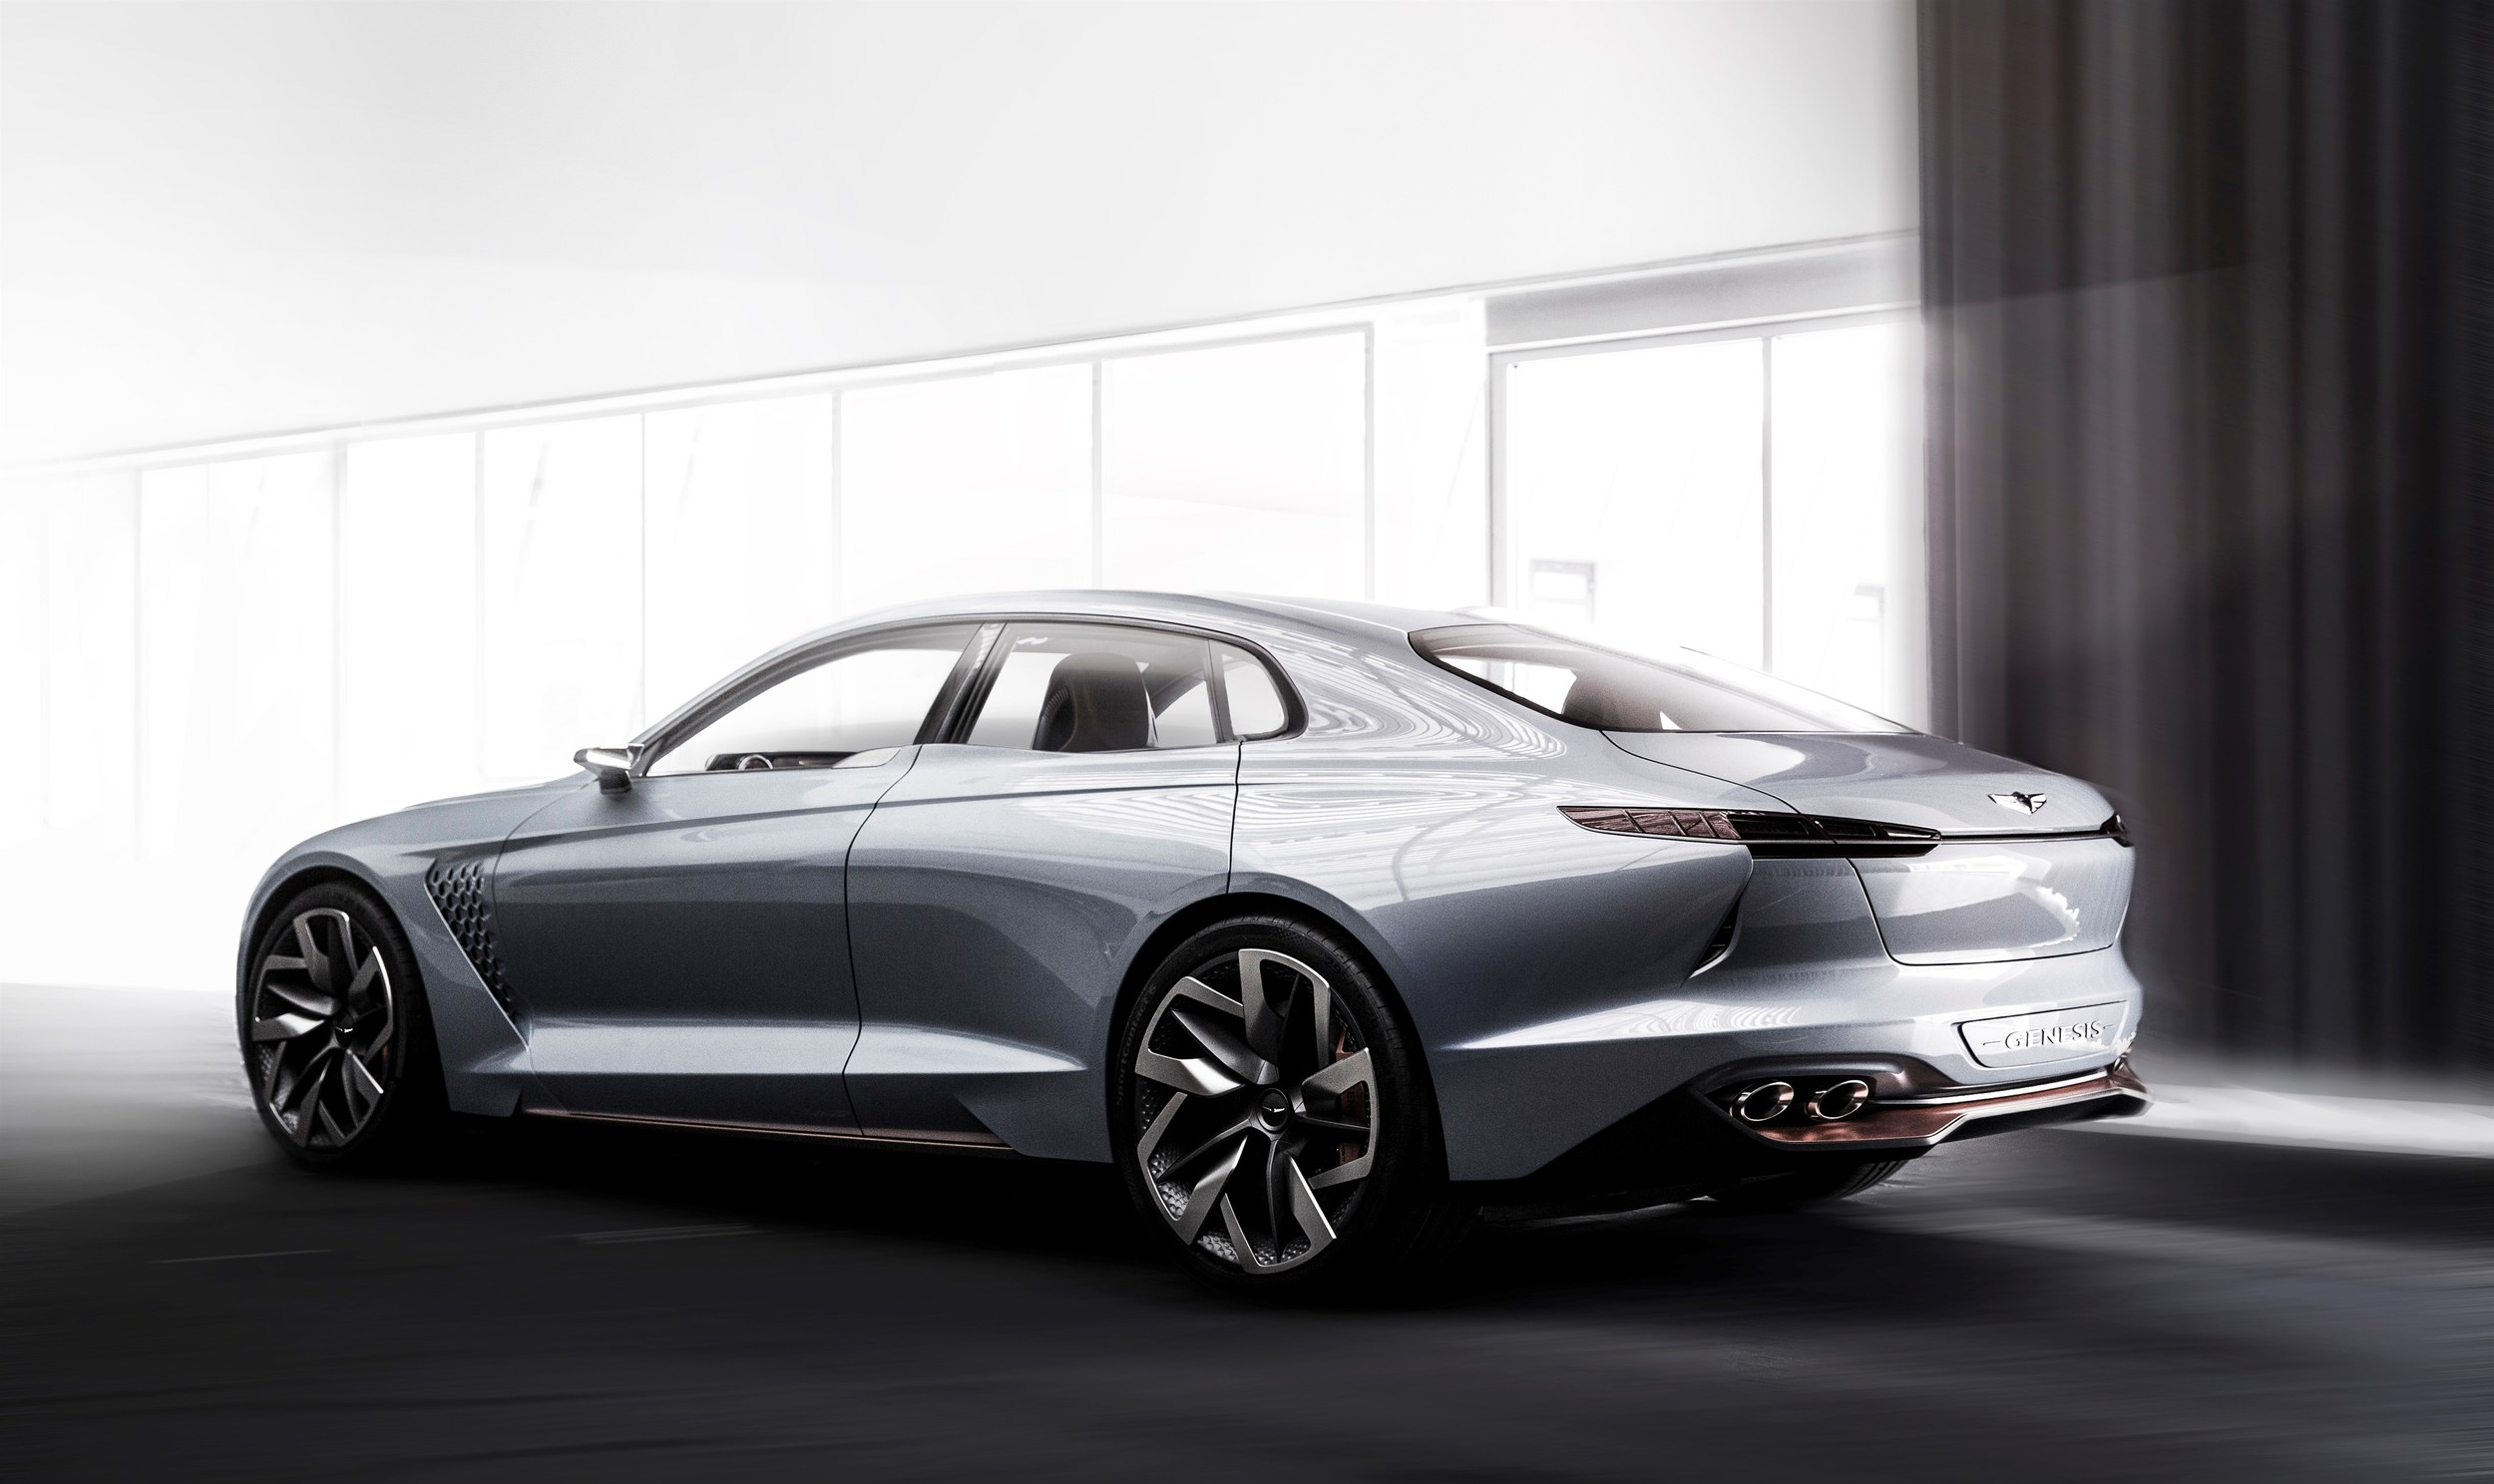 2018 Genesis G70 Imagined by Brenthon Design - autoevolution